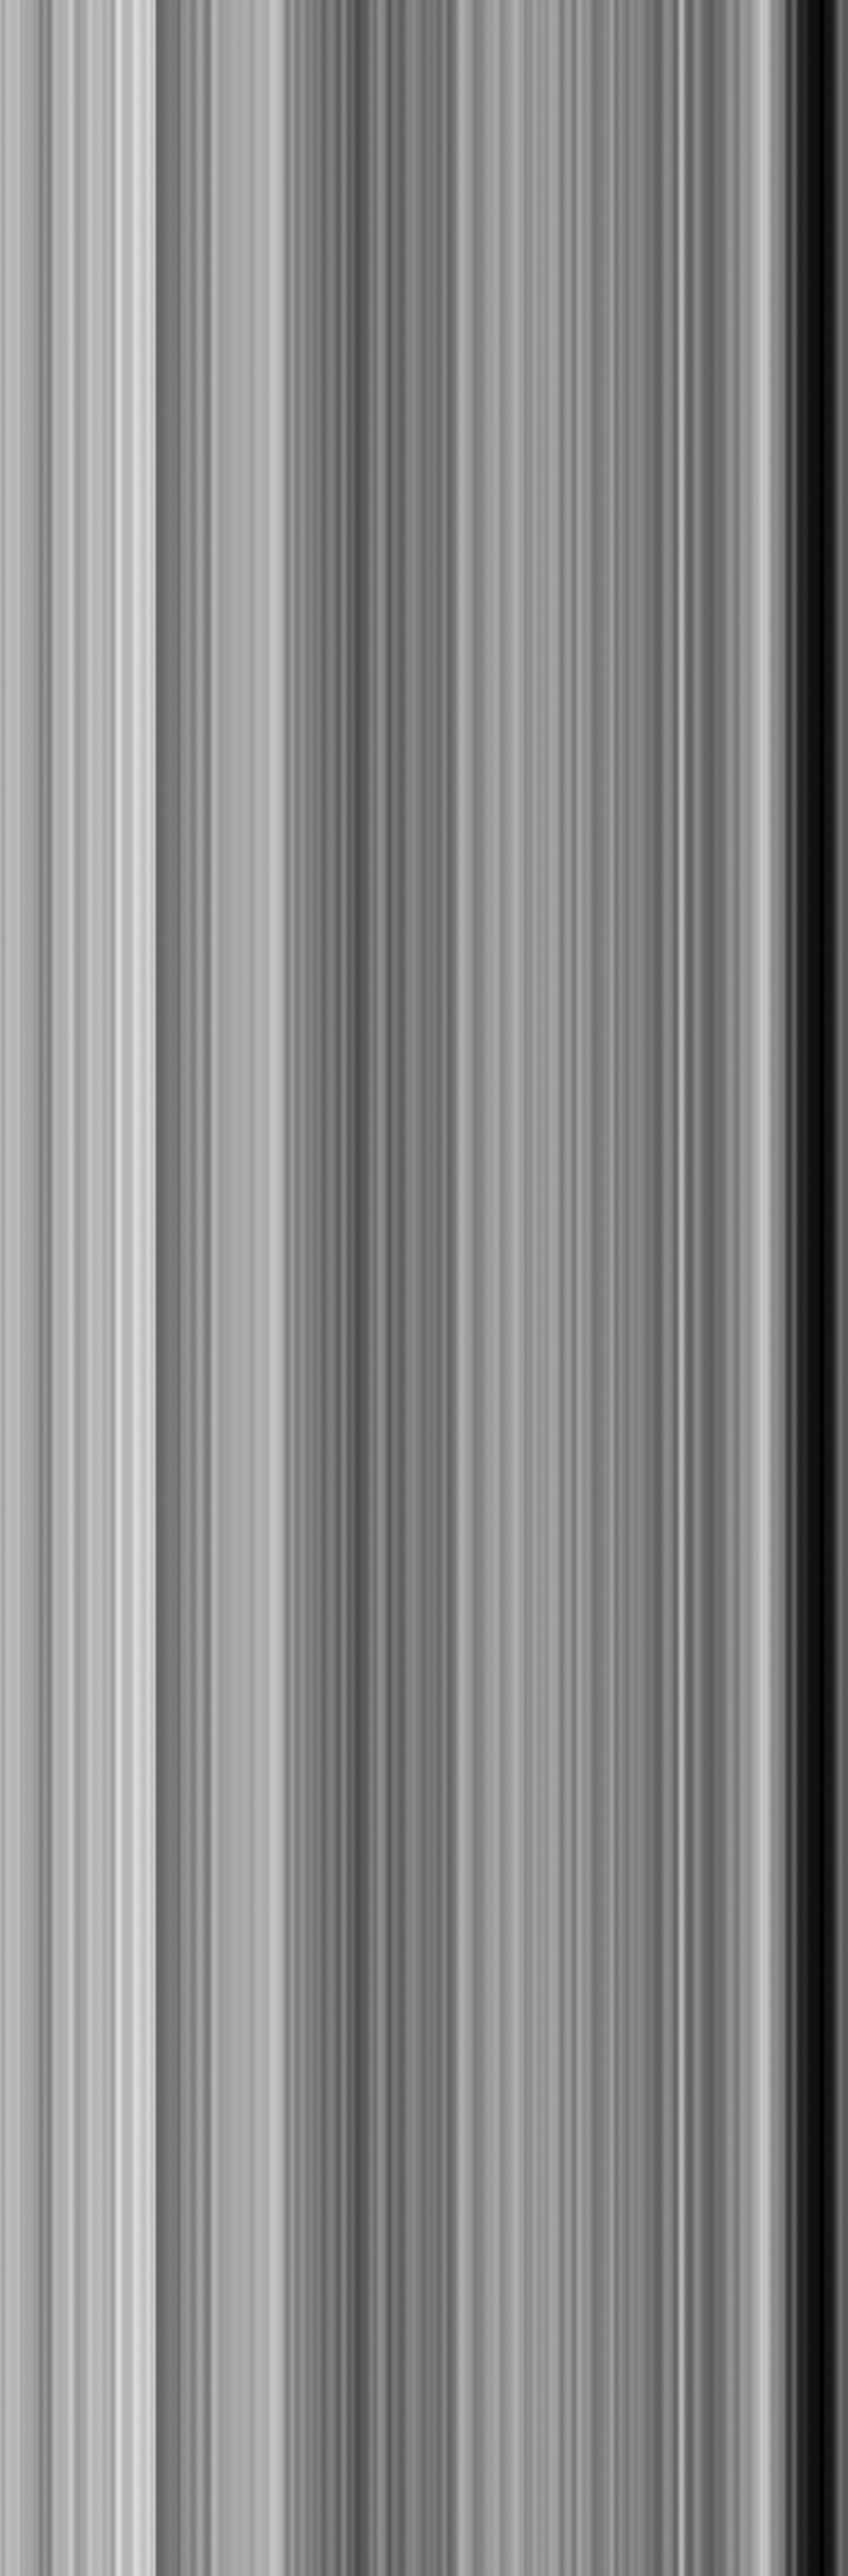 MB Mono stripe 4 Slim